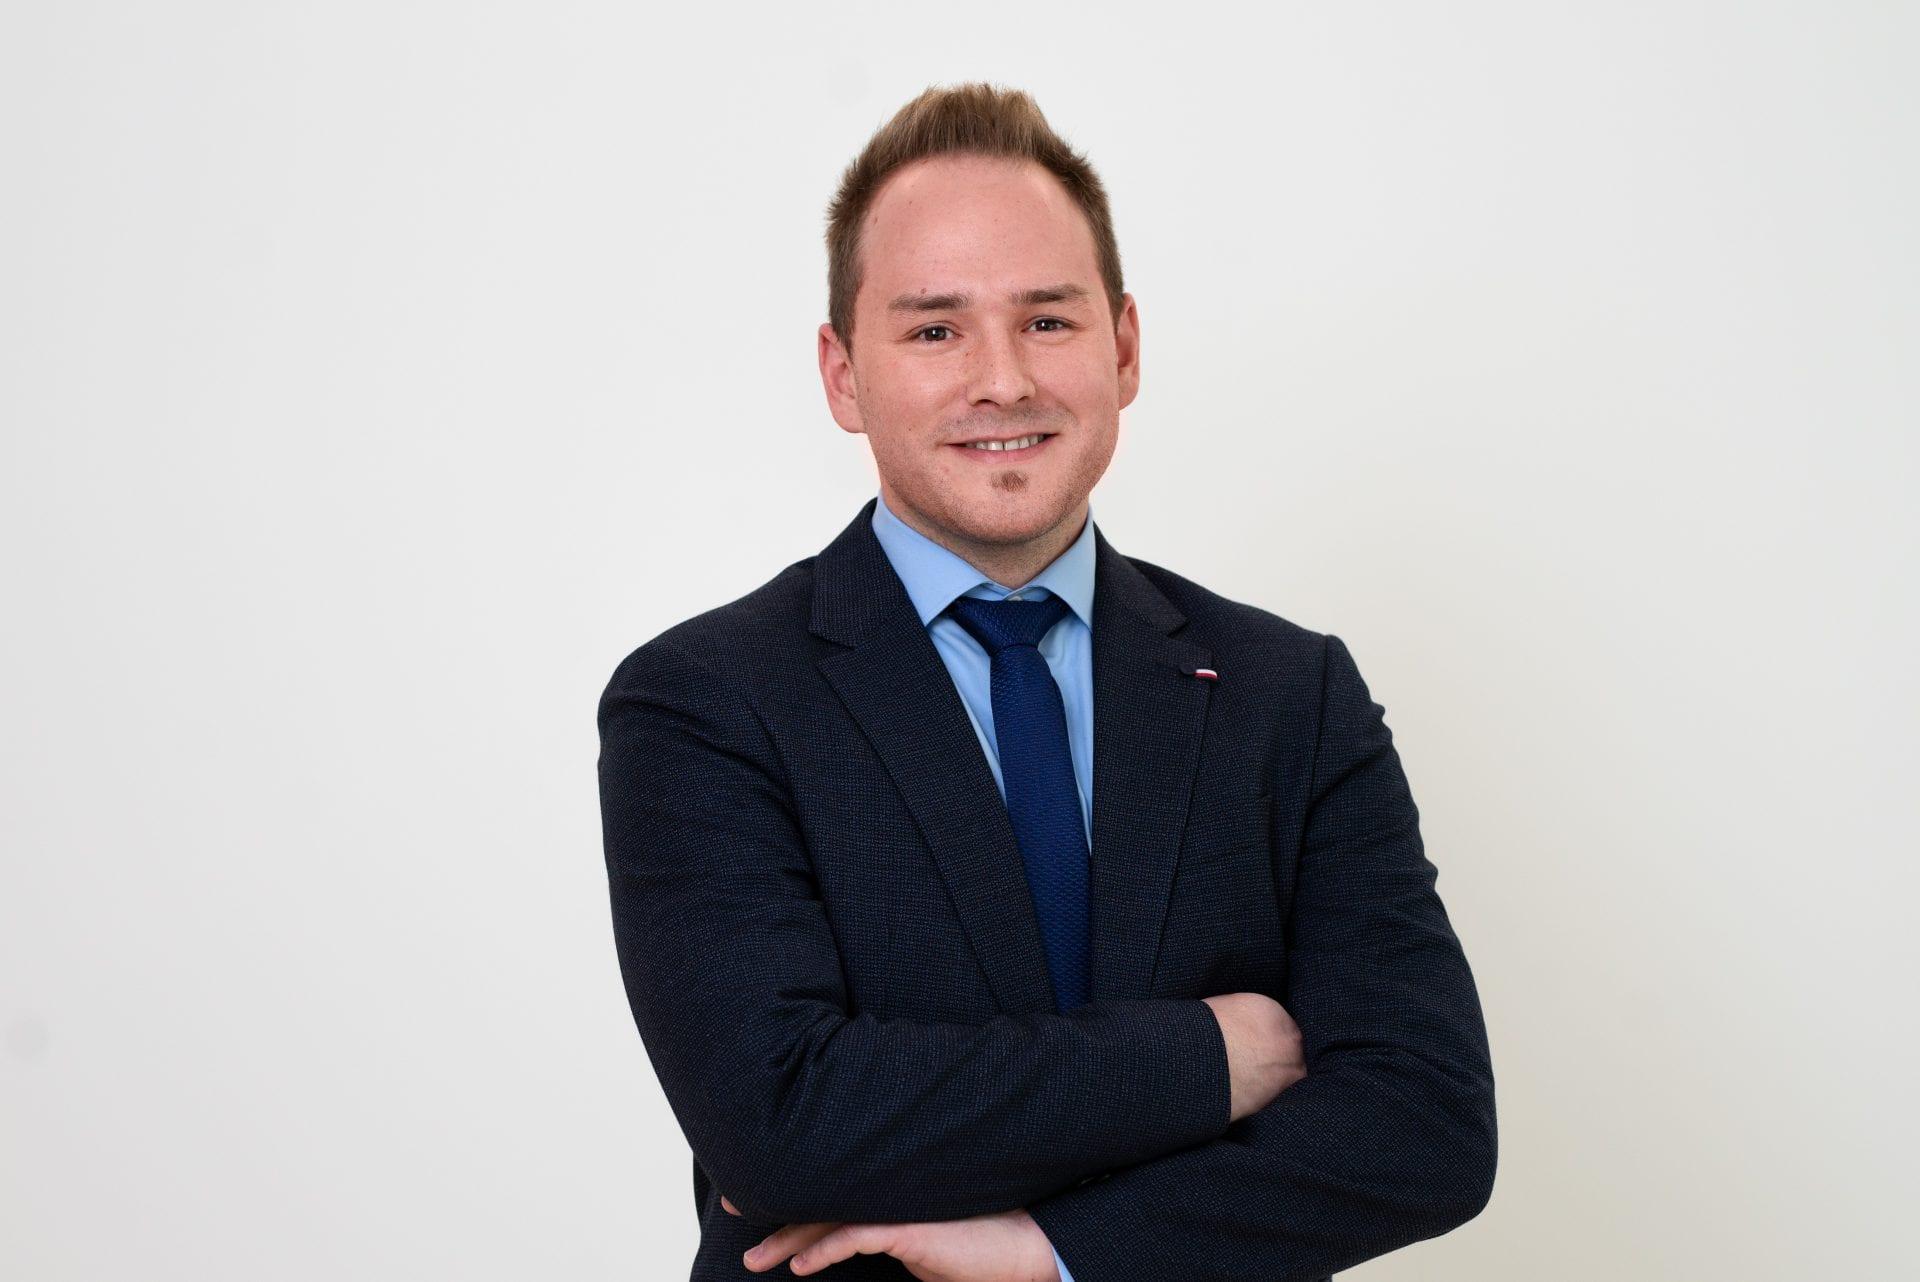 Florian Jeitziner